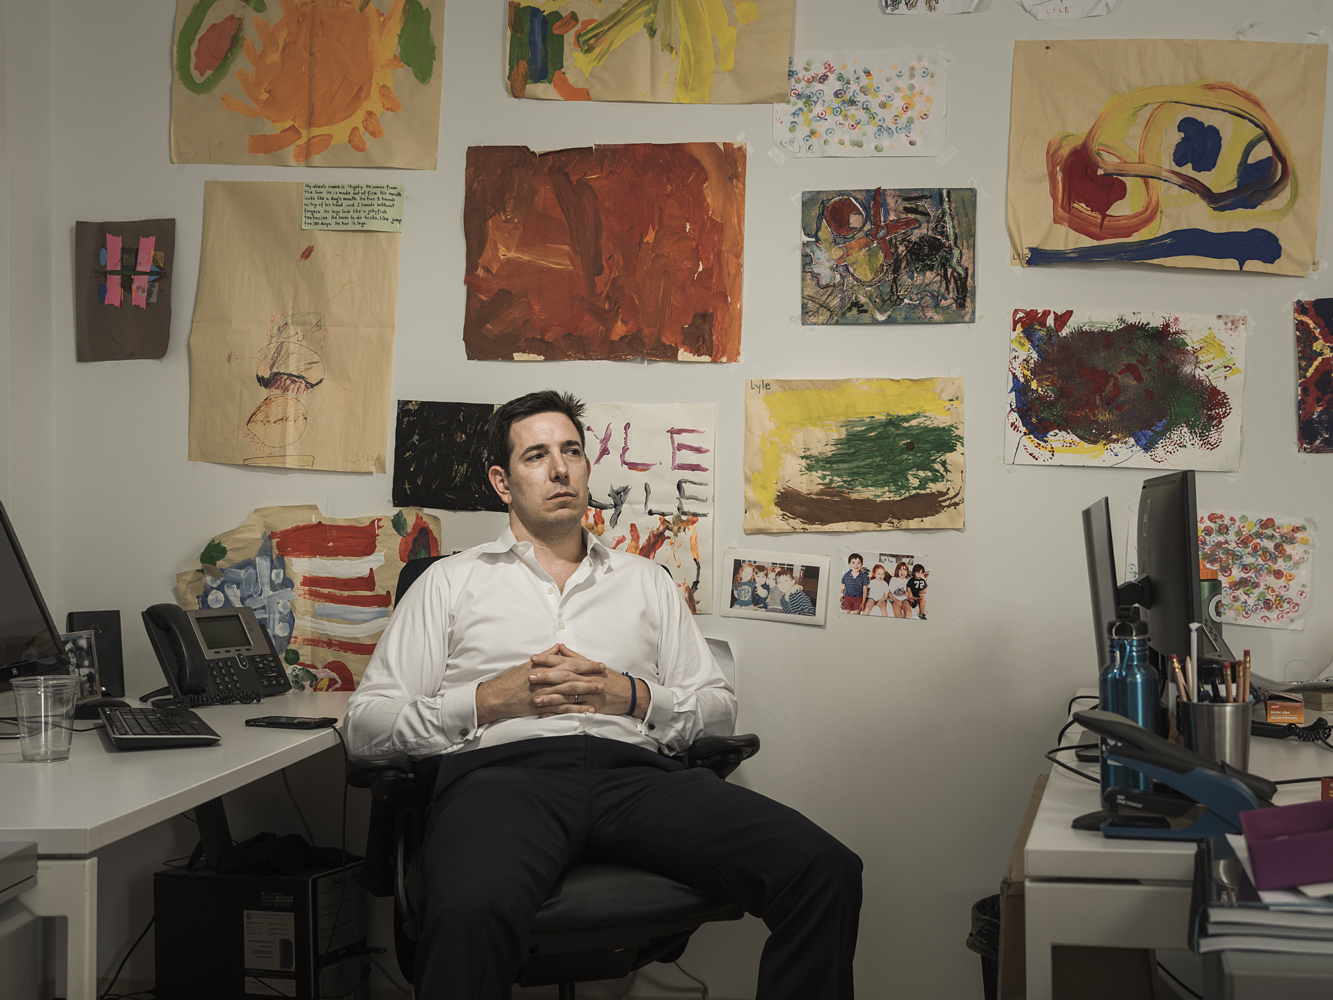 Bradley Tusk at his desk. (Sasha Maslov For Observer)